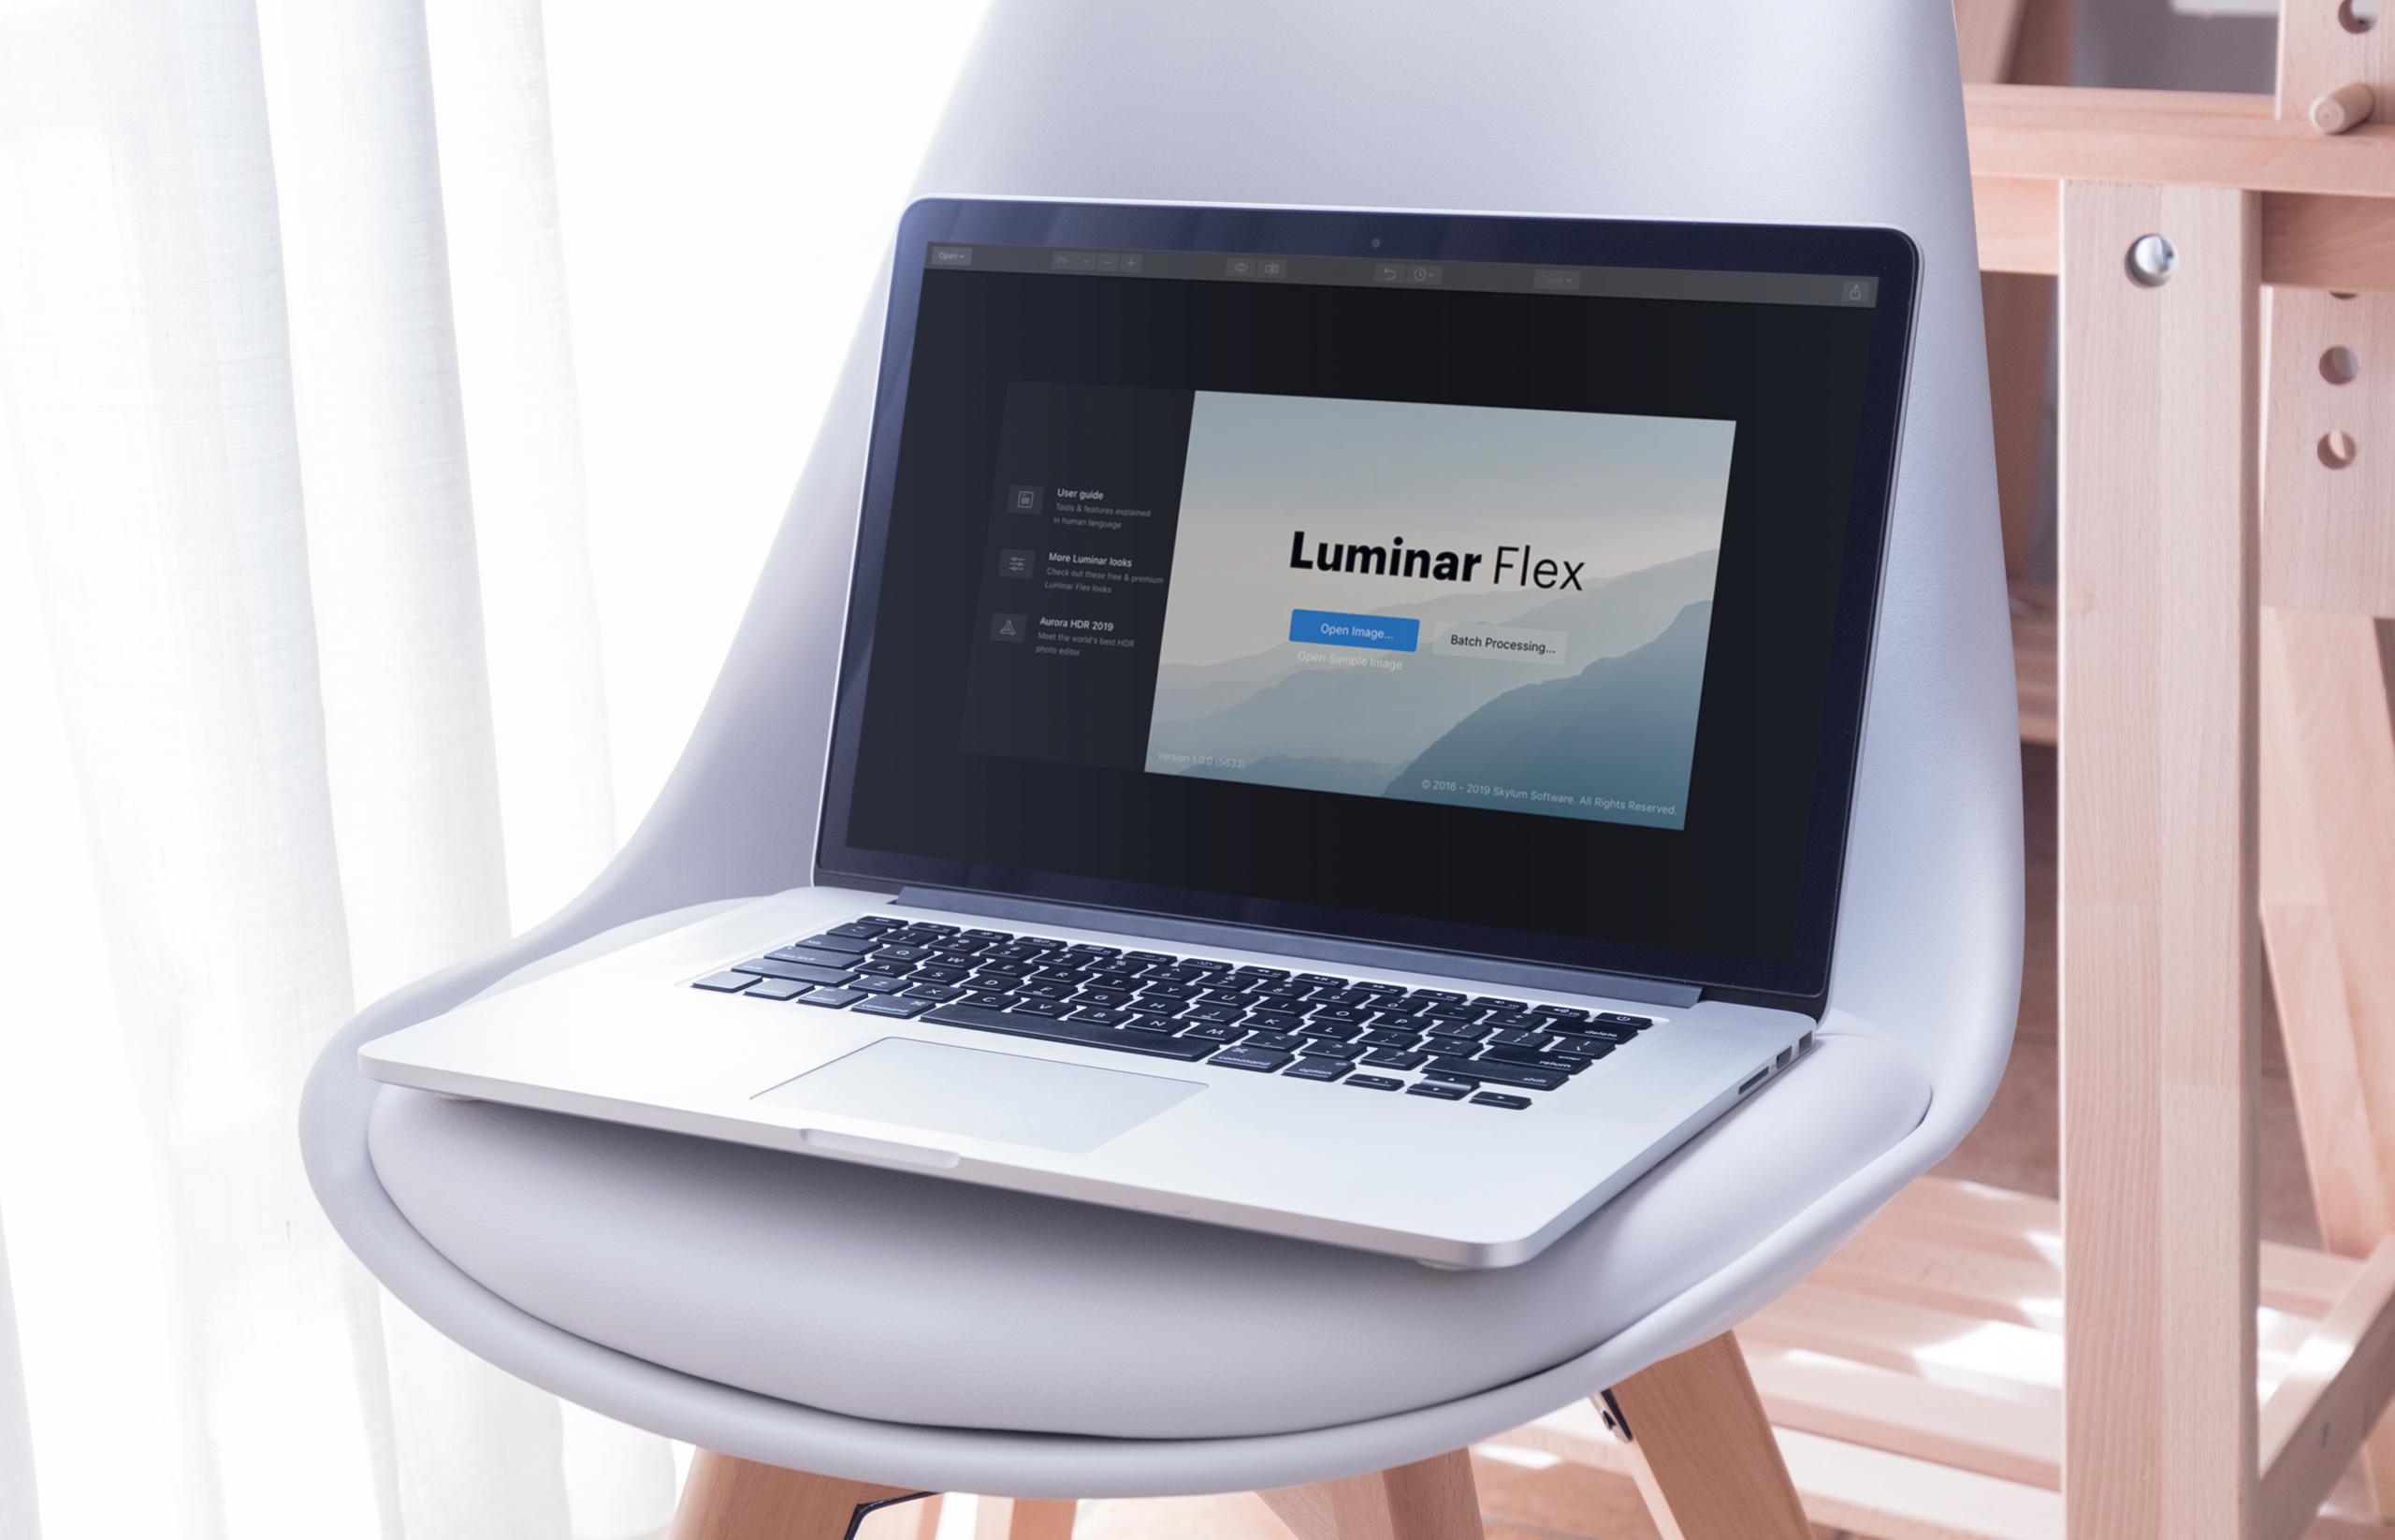 Best Laptop for Luminar 3